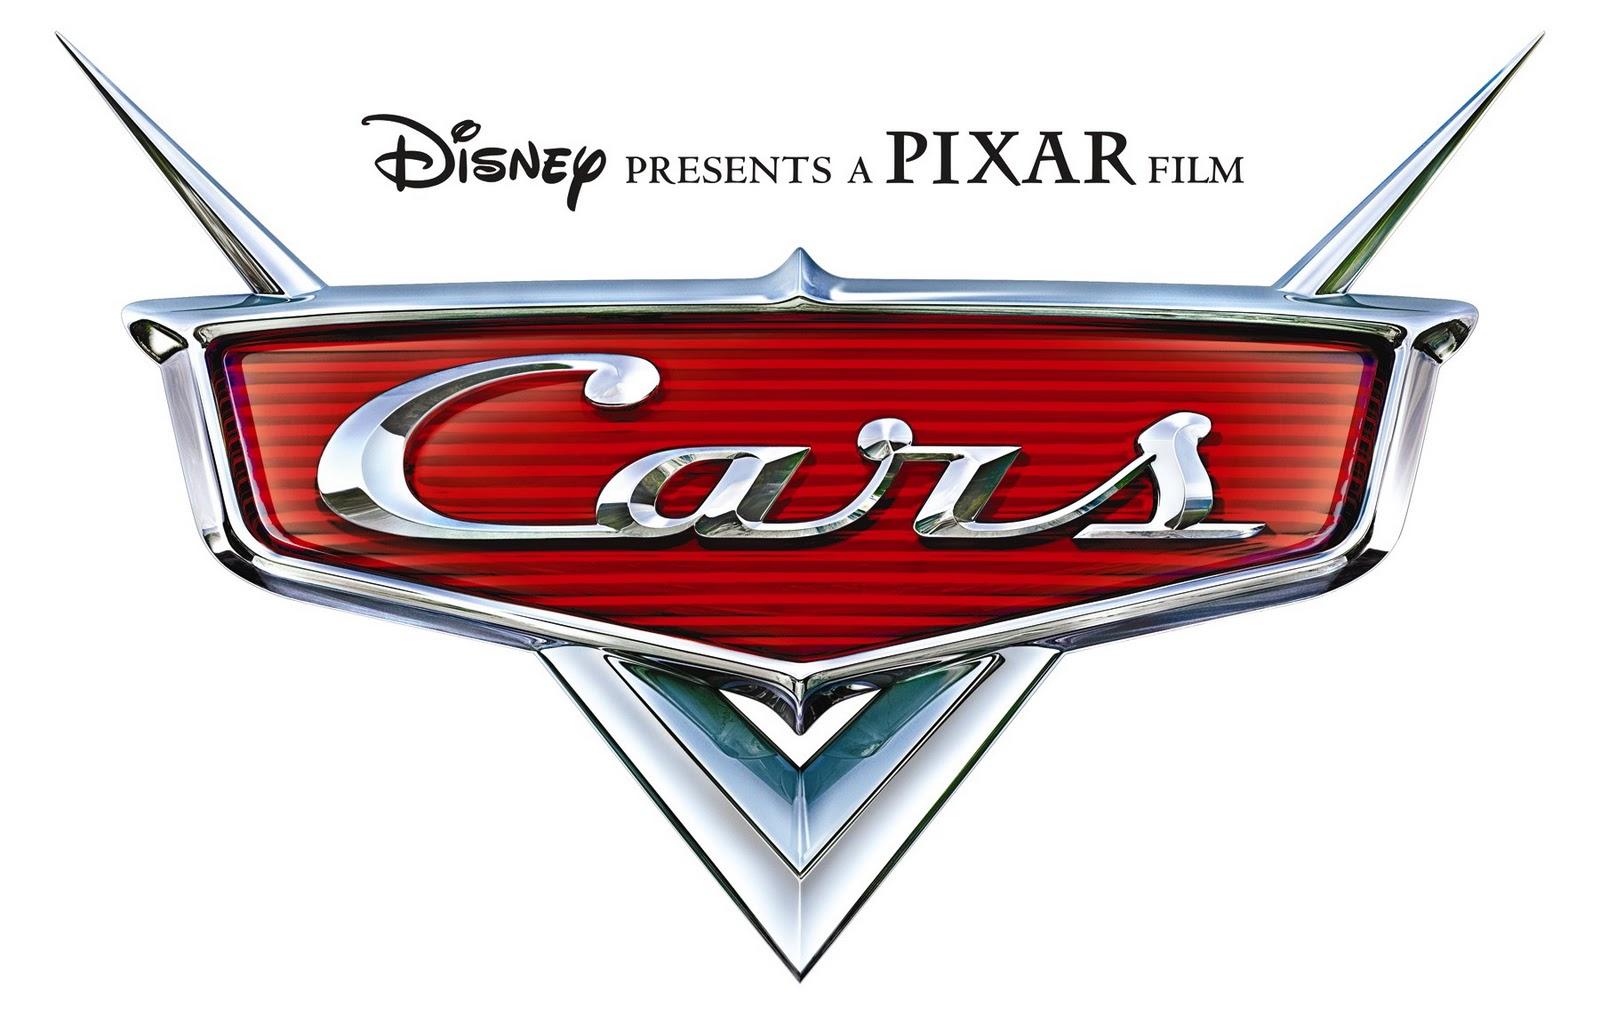 http://3.bp.blogspot.com/_RyGn72yKelM/TL6F6I6gbwI/AAAAAAAAAAQ/10X2tWuOHUs/s1600/%5BWallpaper%5D+Pixar+Disney+Cars+Logo.jpg